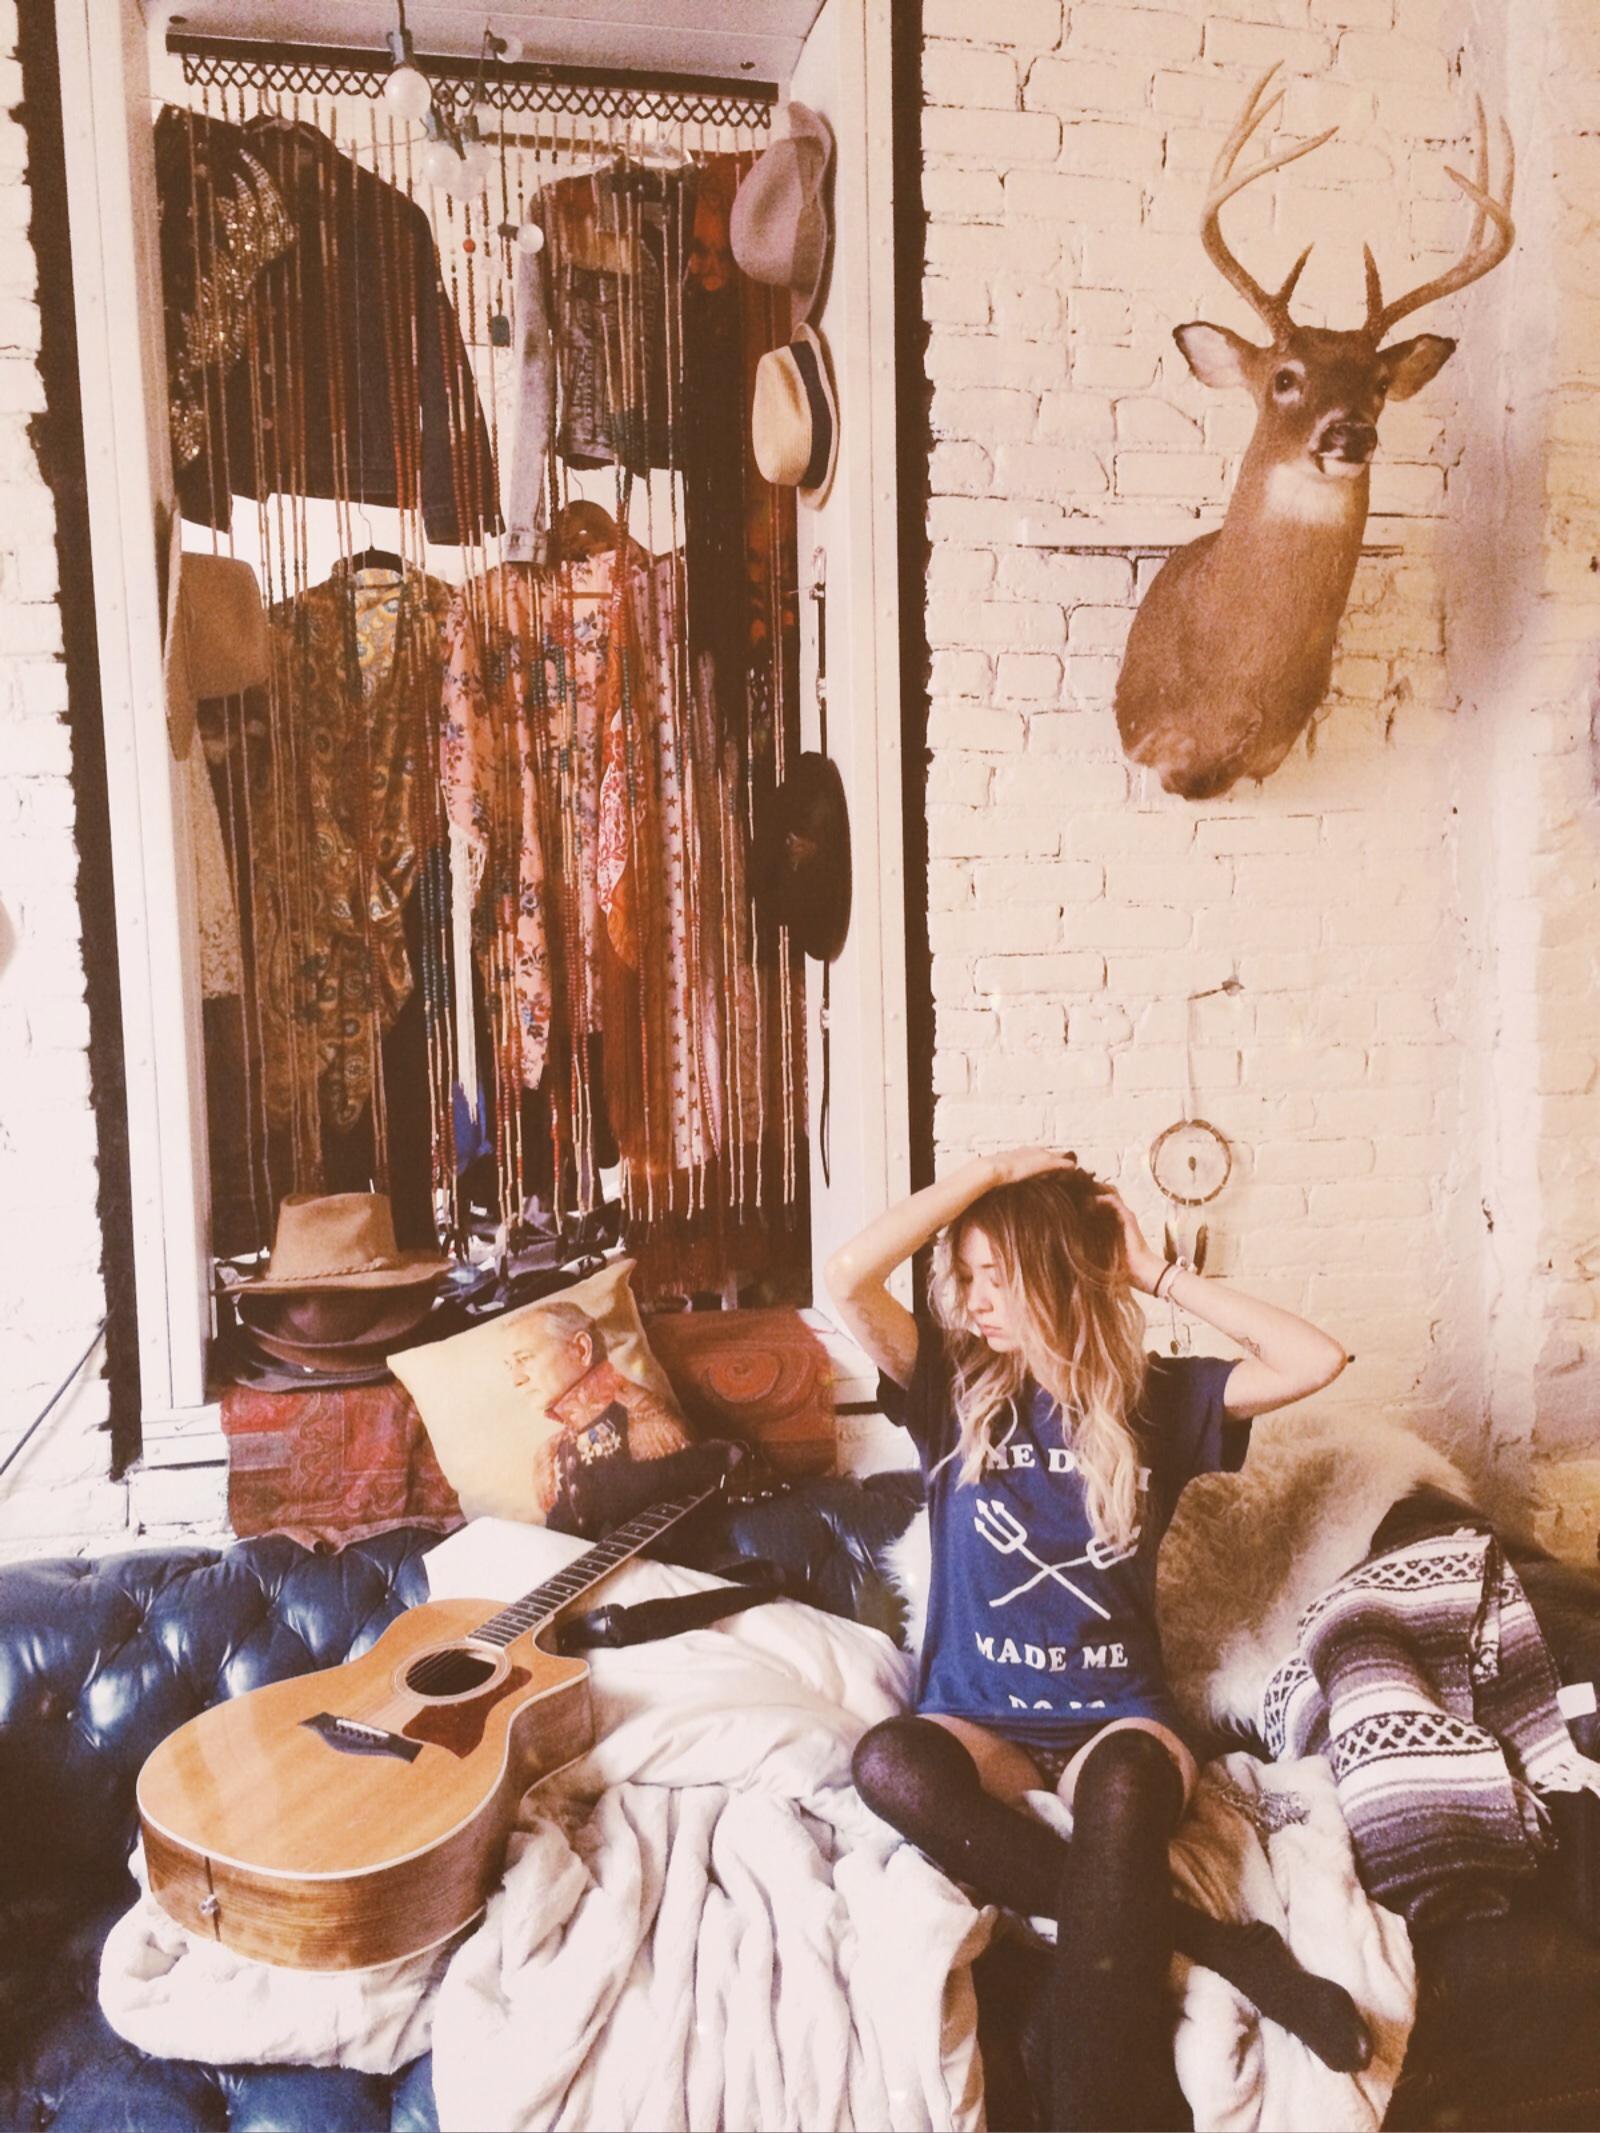 Leah Hoffman via The Bohemian Collective